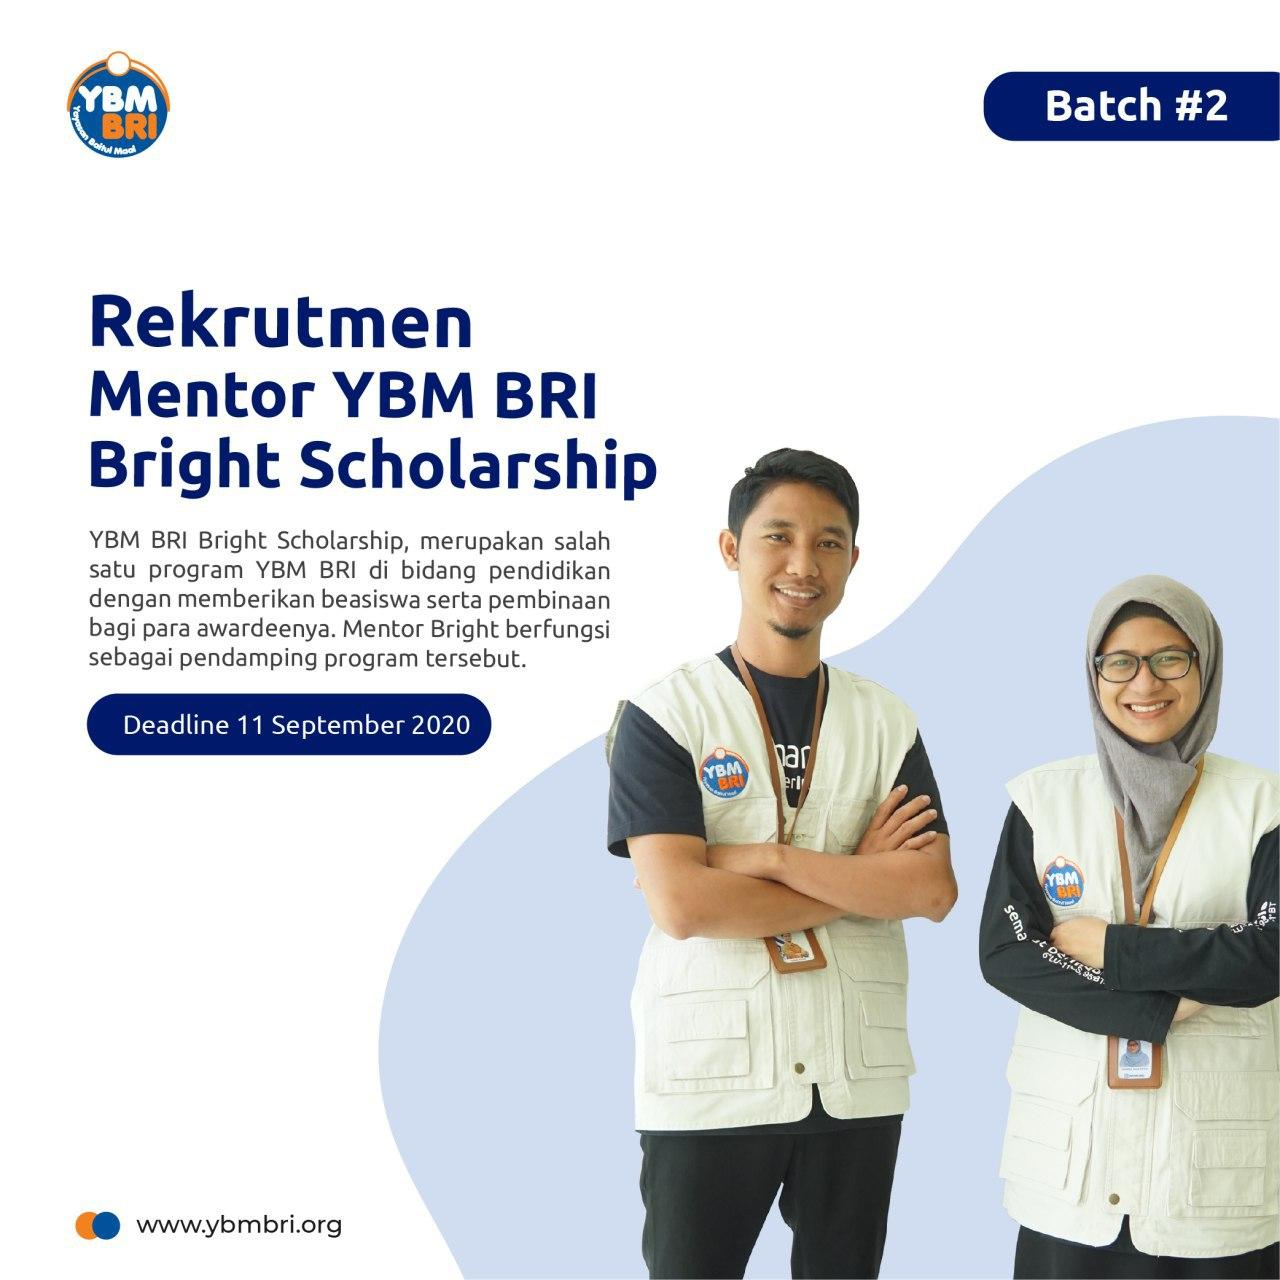 Rekrutmen Mentor Program Bright Scholarship Tahun 2020 #Batch2